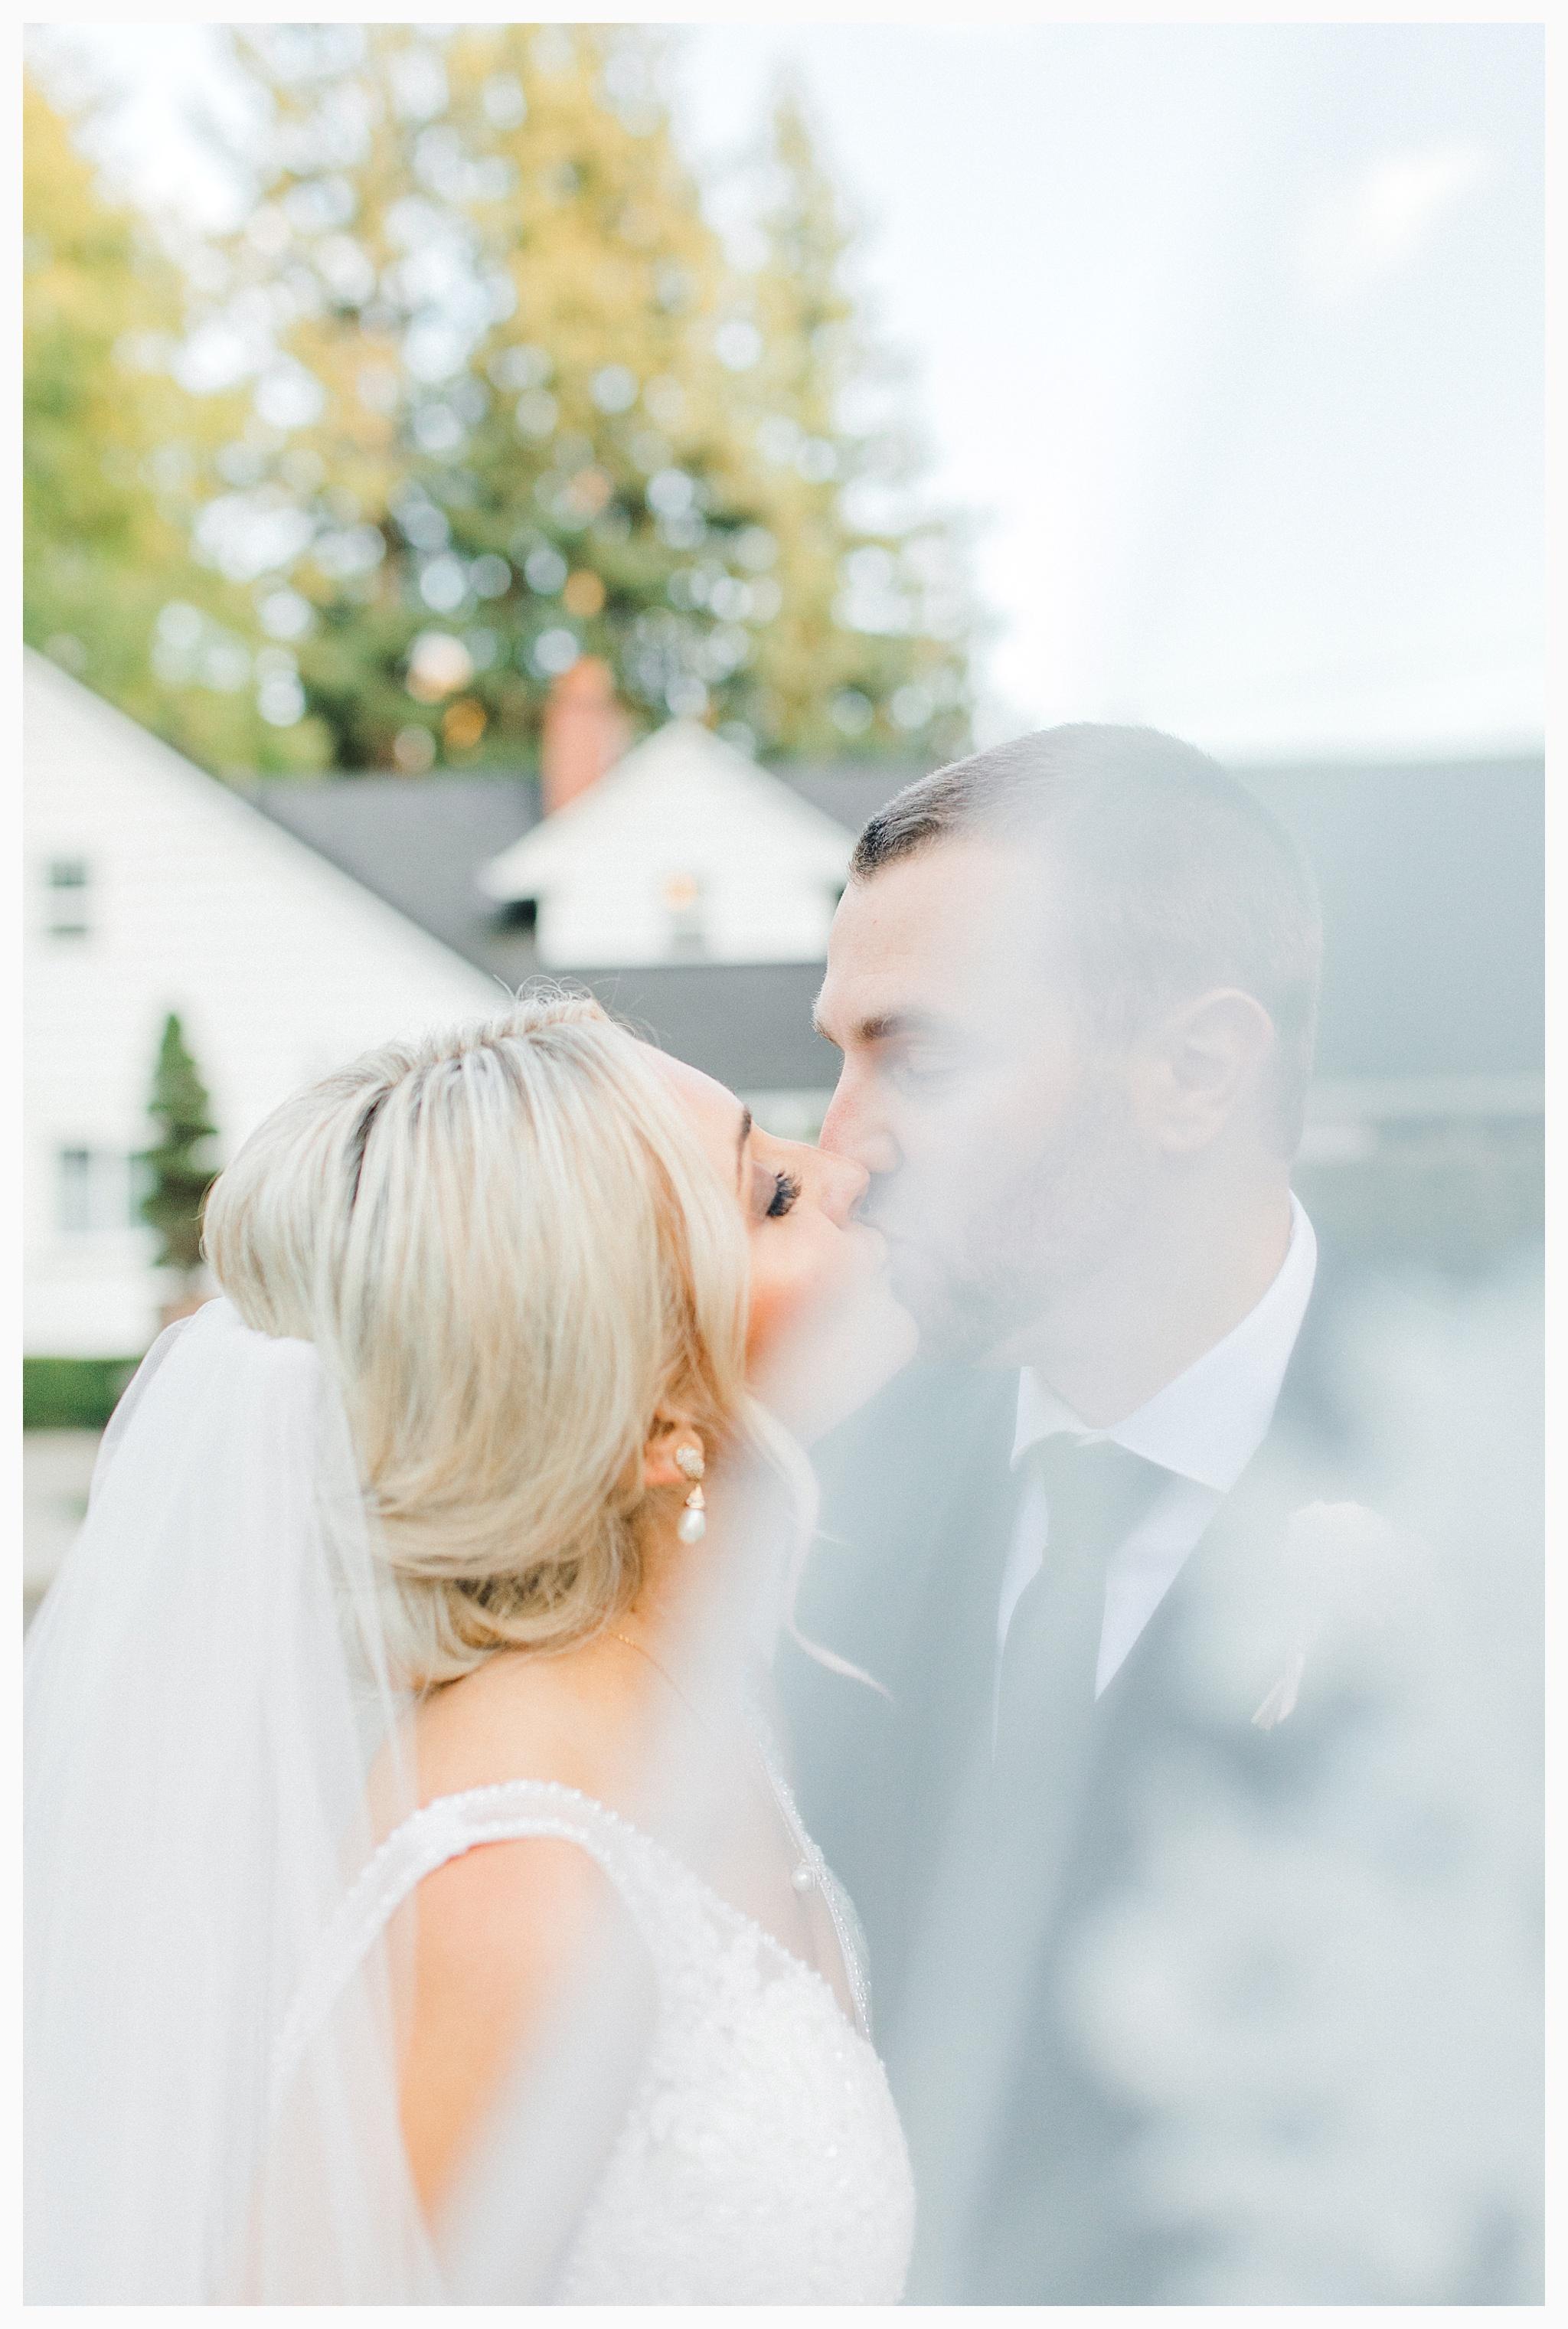 Emma Rose Company Light and Airy Wedding Photographer, Beautiful fall wedding at Rock Creek Gardens Venue in Puyallup, Washington._0085.jpg